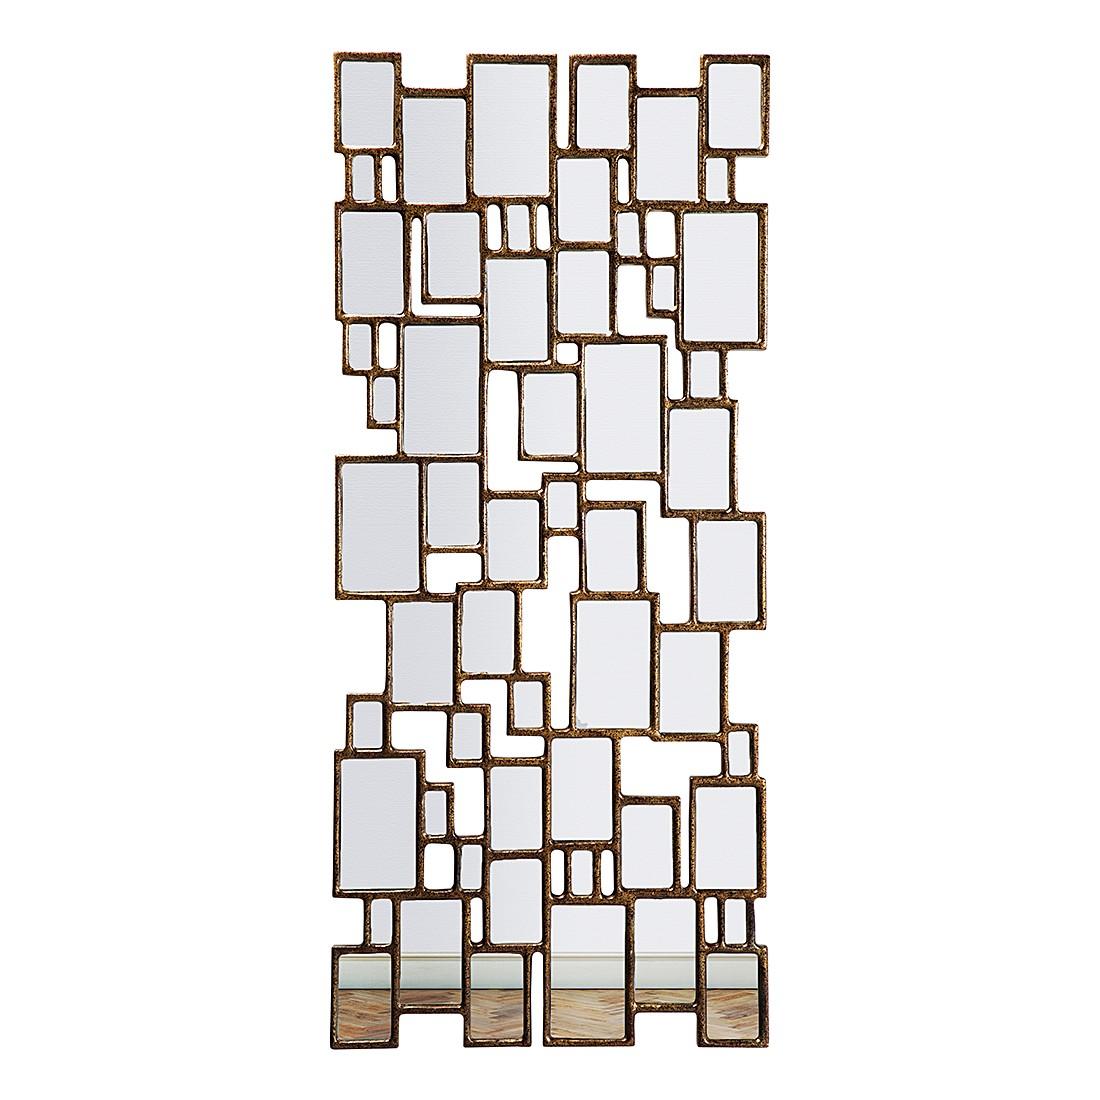 spiegel cubes kupfer spiegelglas kare design bestellen. Black Bedroom Furniture Sets. Home Design Ideas